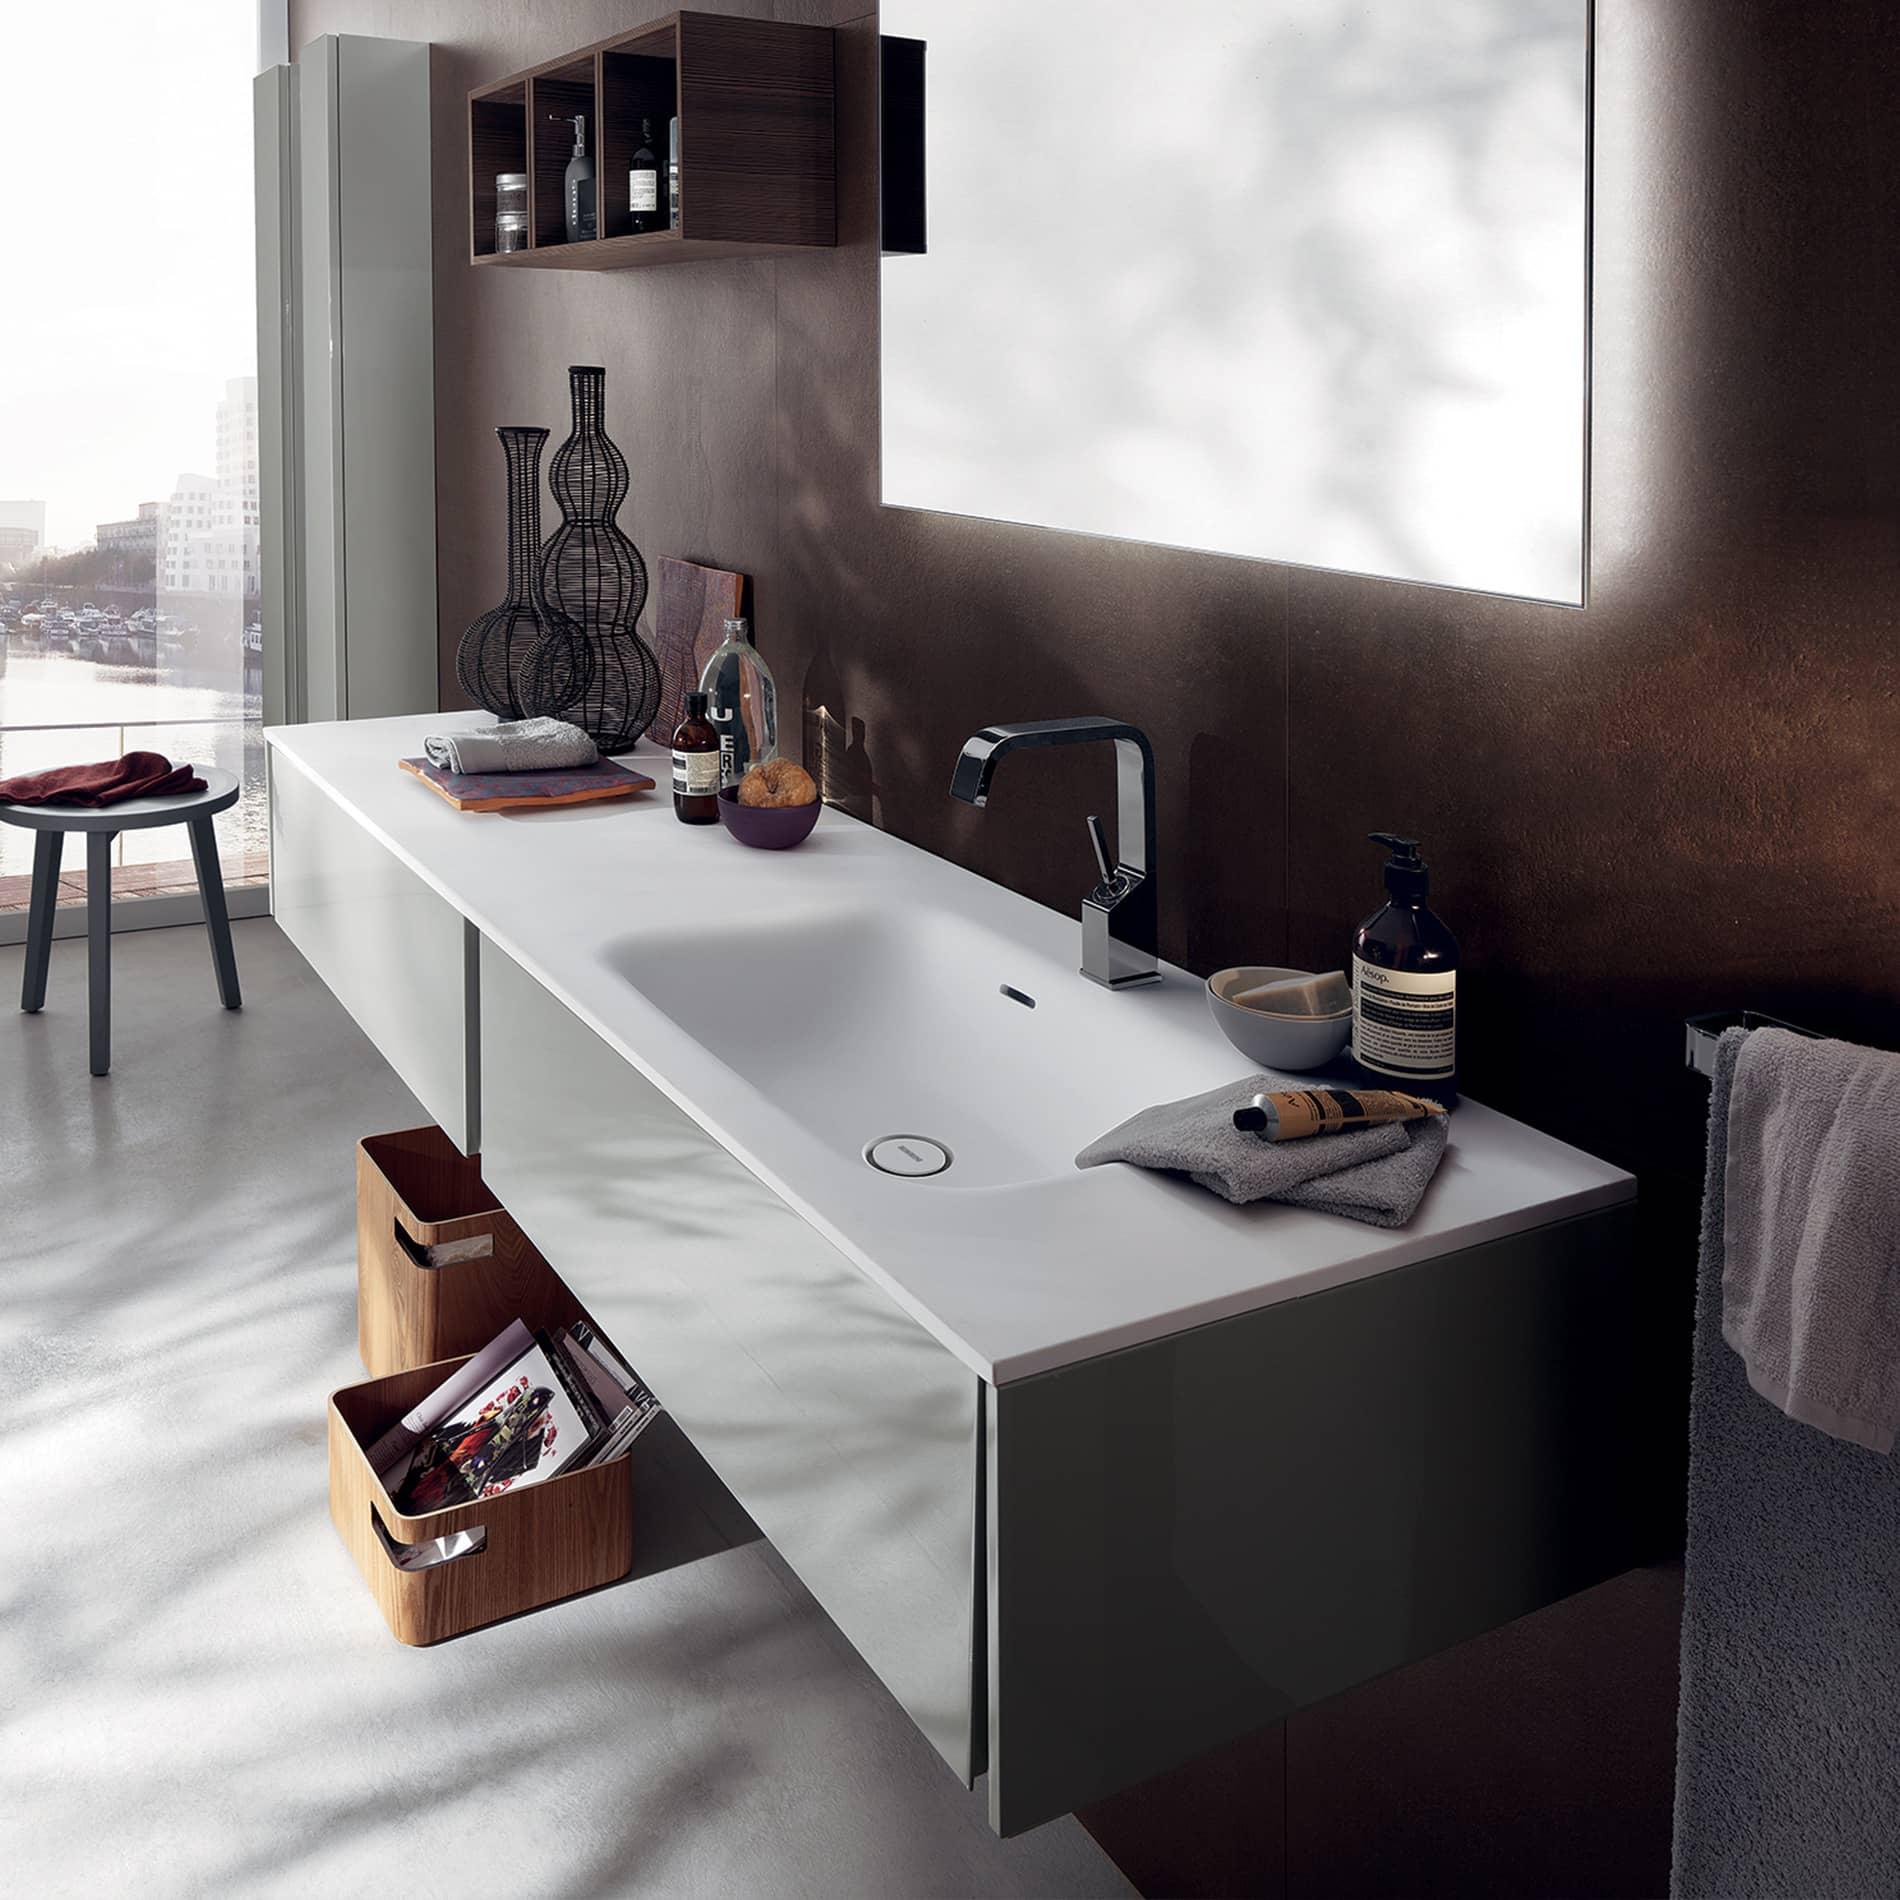 Cristalplant-products-Scavolini-washbasins-1